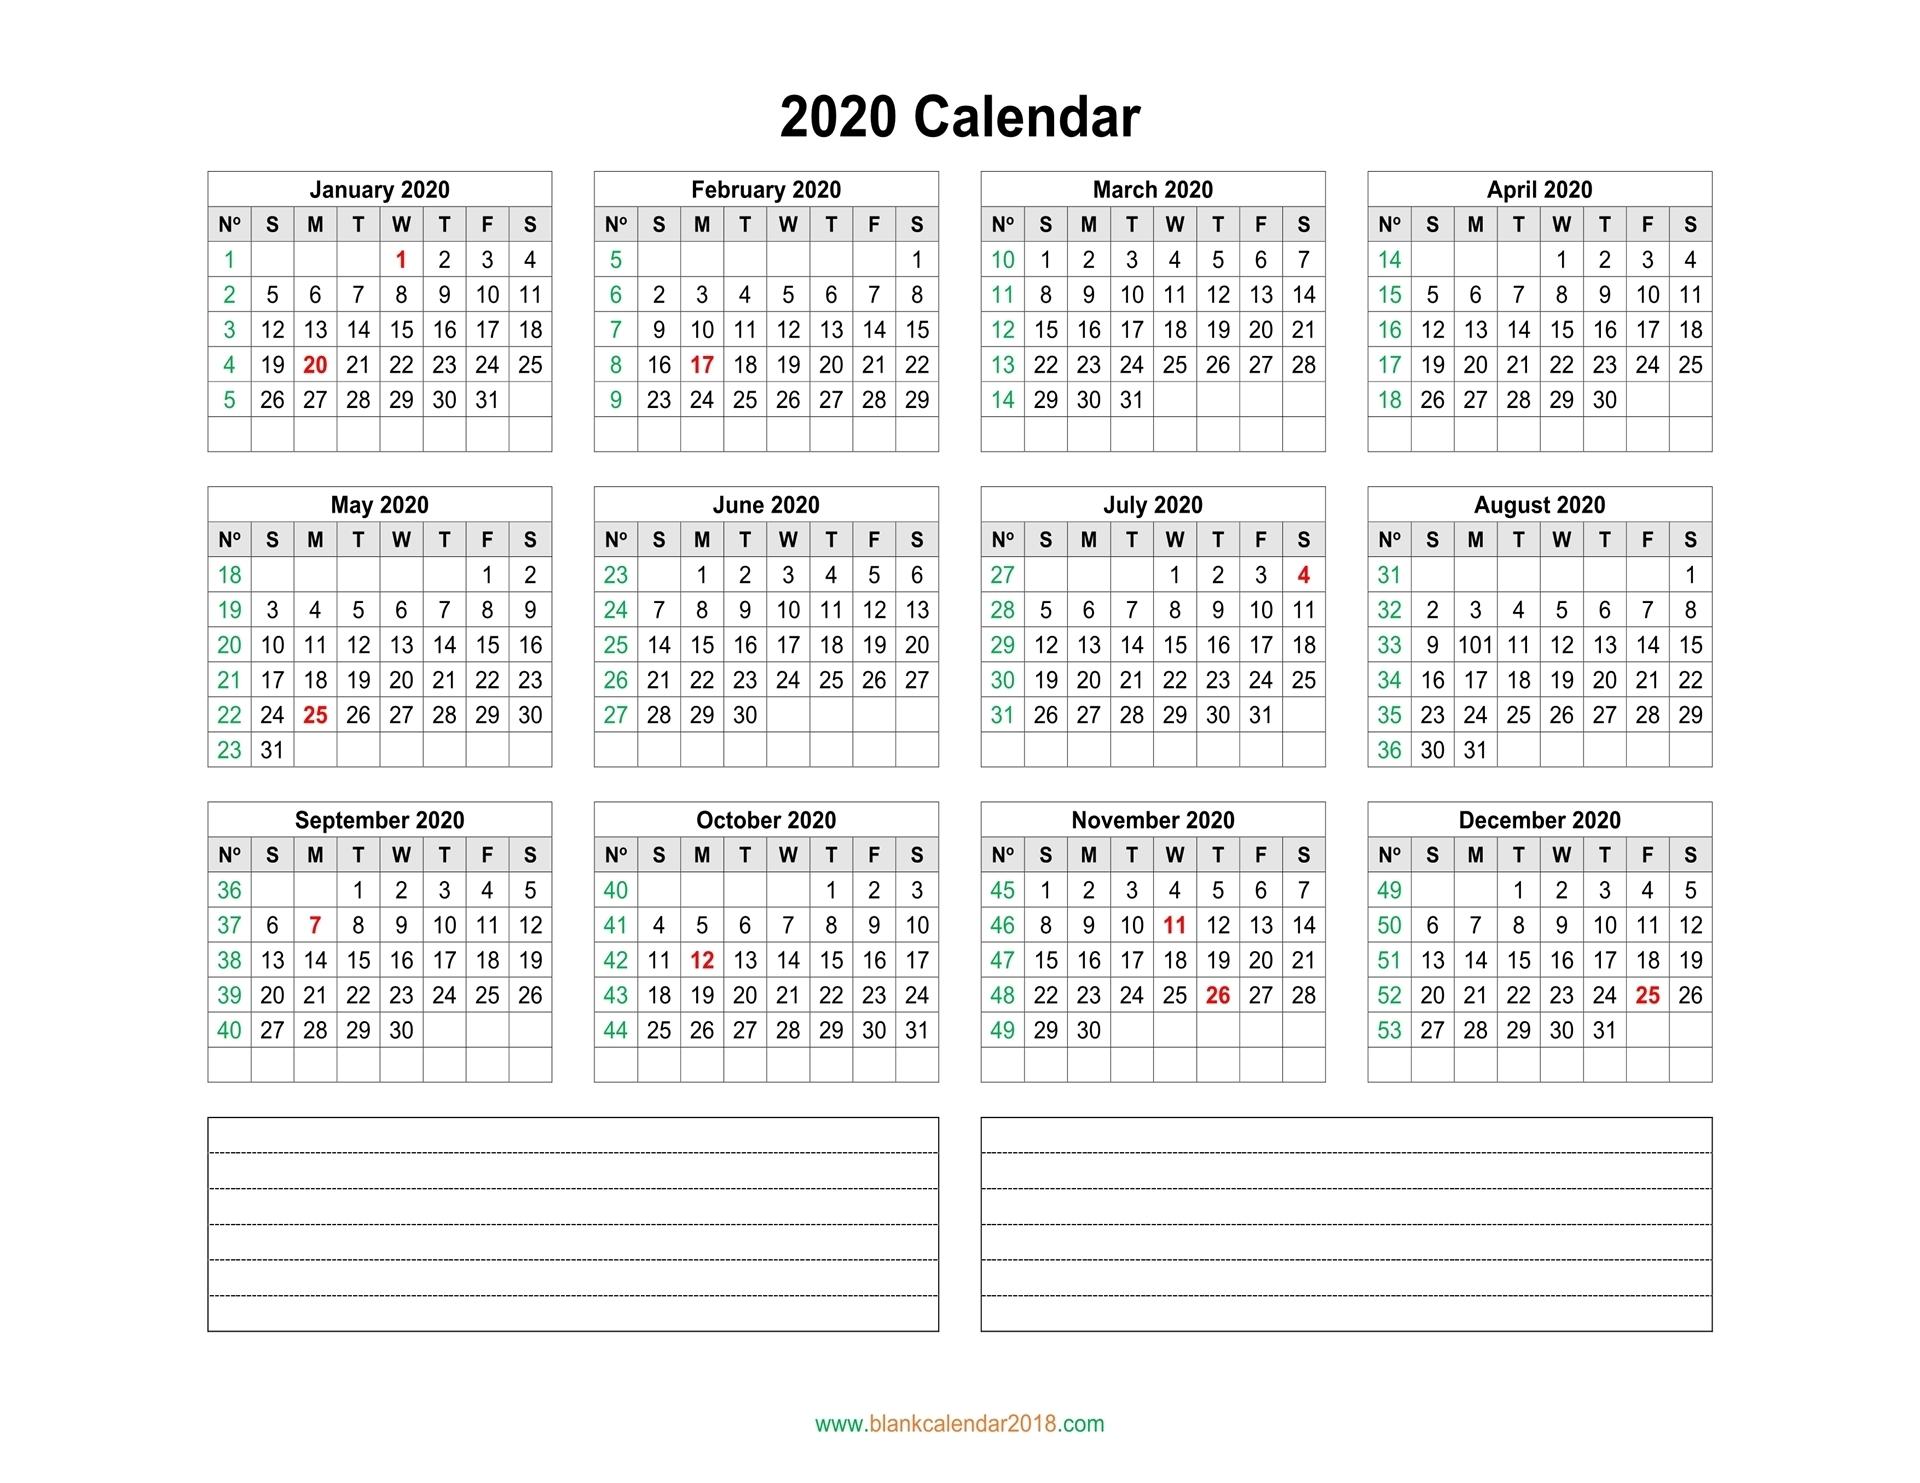 Blank Calendar 2020 inside Year At A Glance Calendar 2020 With Holiday Free Printable